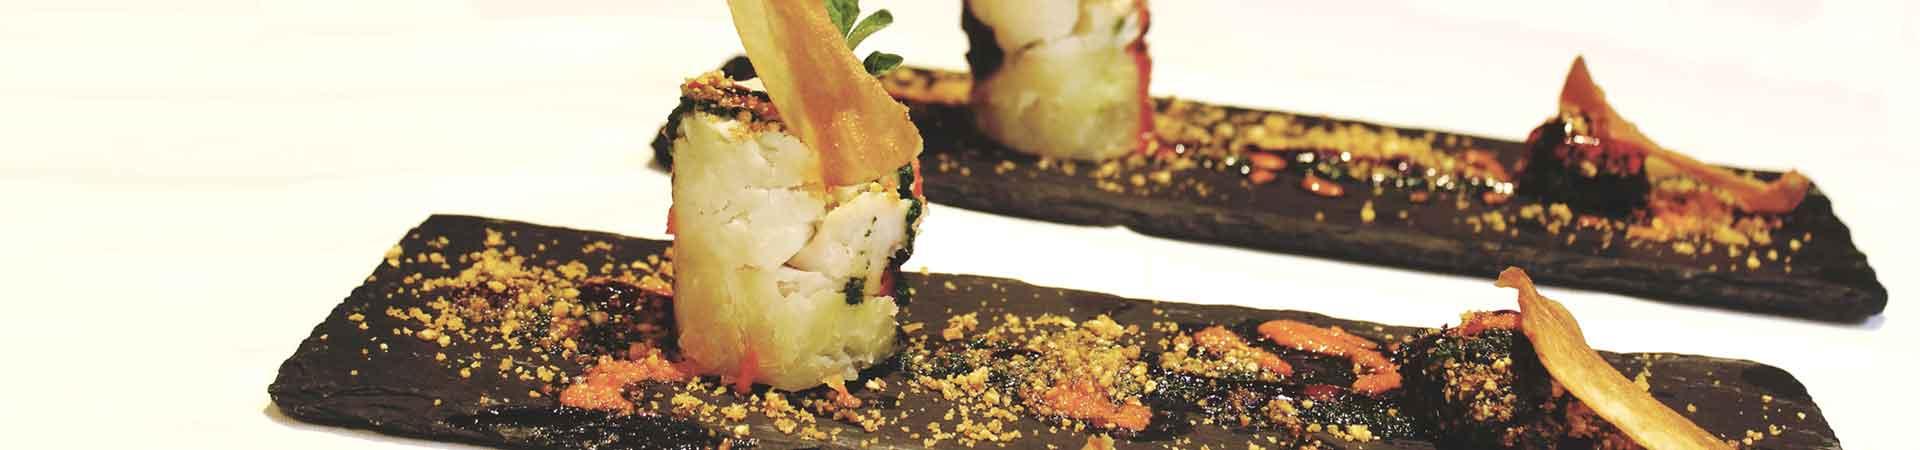 https://www.goodmorningtenerife.com/wp-content/uploads/2017/01/01_slide_restaurant-mirador-garachico-1920x450-good-morning-tenerife.jpg